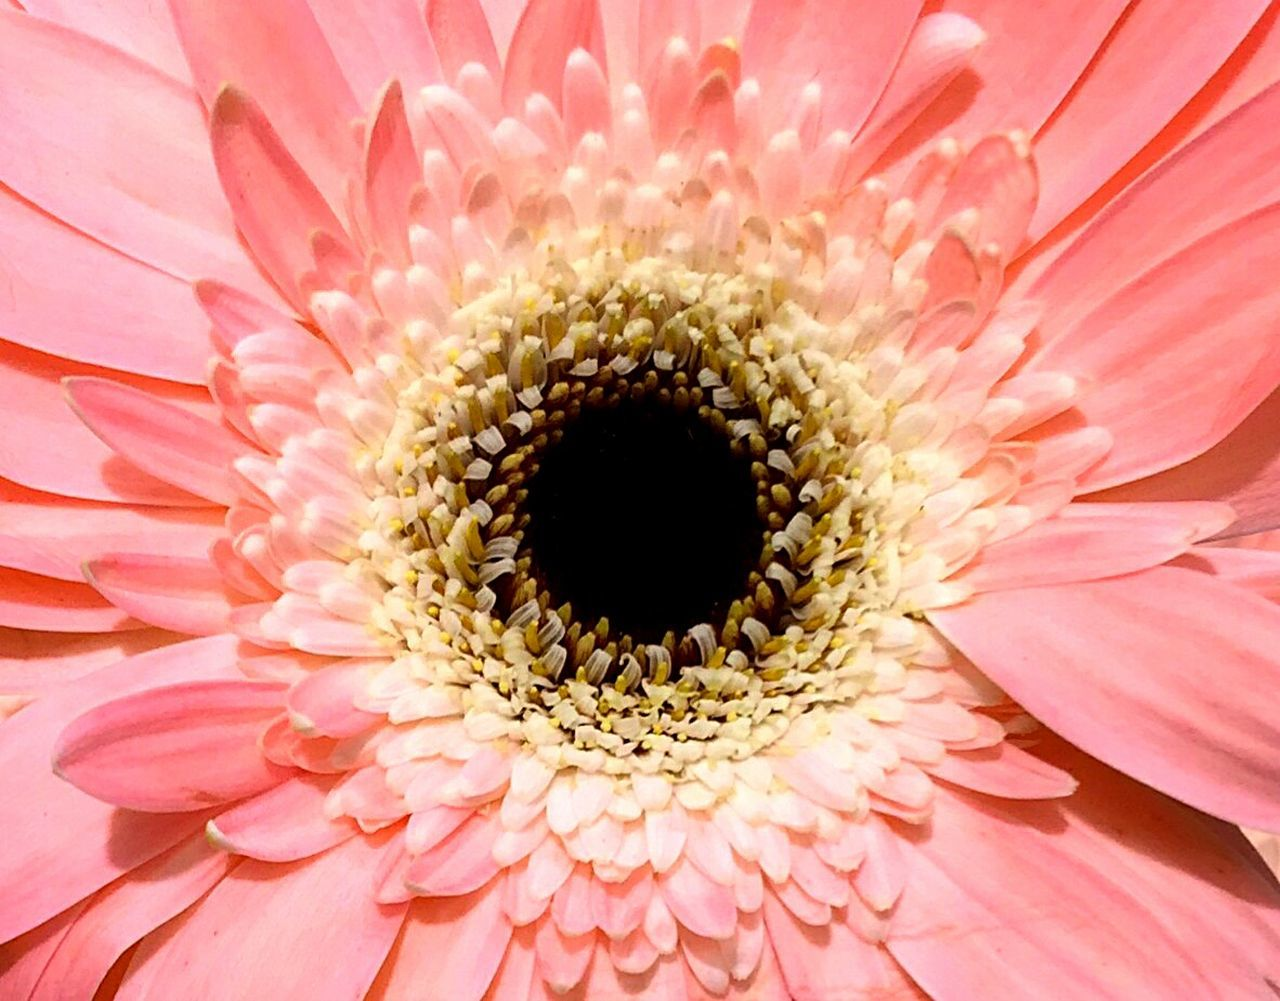 Pink Flower Pink Showcase: January Gerbera Daisy EyeEm Best Shots - Flowers EyeEm Best Shots Flowers Flowers,Plants & Garden Pastel Power Macro Macro_flower Up Close Flowerporn Pink Color Pink Flowers Pink Daisy Gerbera Gerbera Flower Macro Nature Colorful